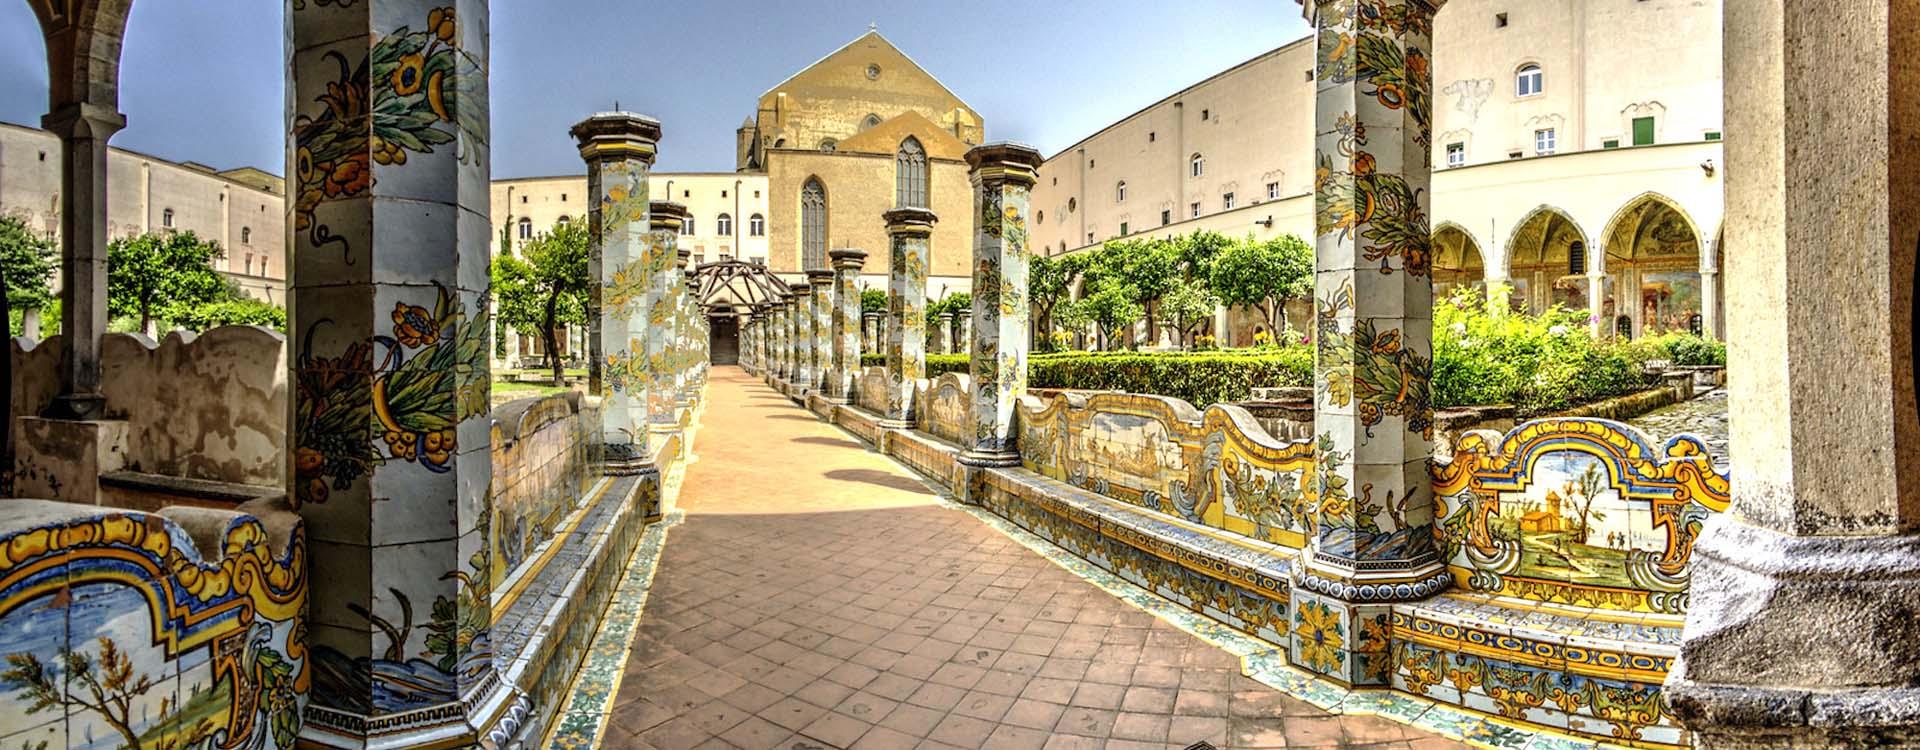 chiostro-monastero-santa-chiara-napoli